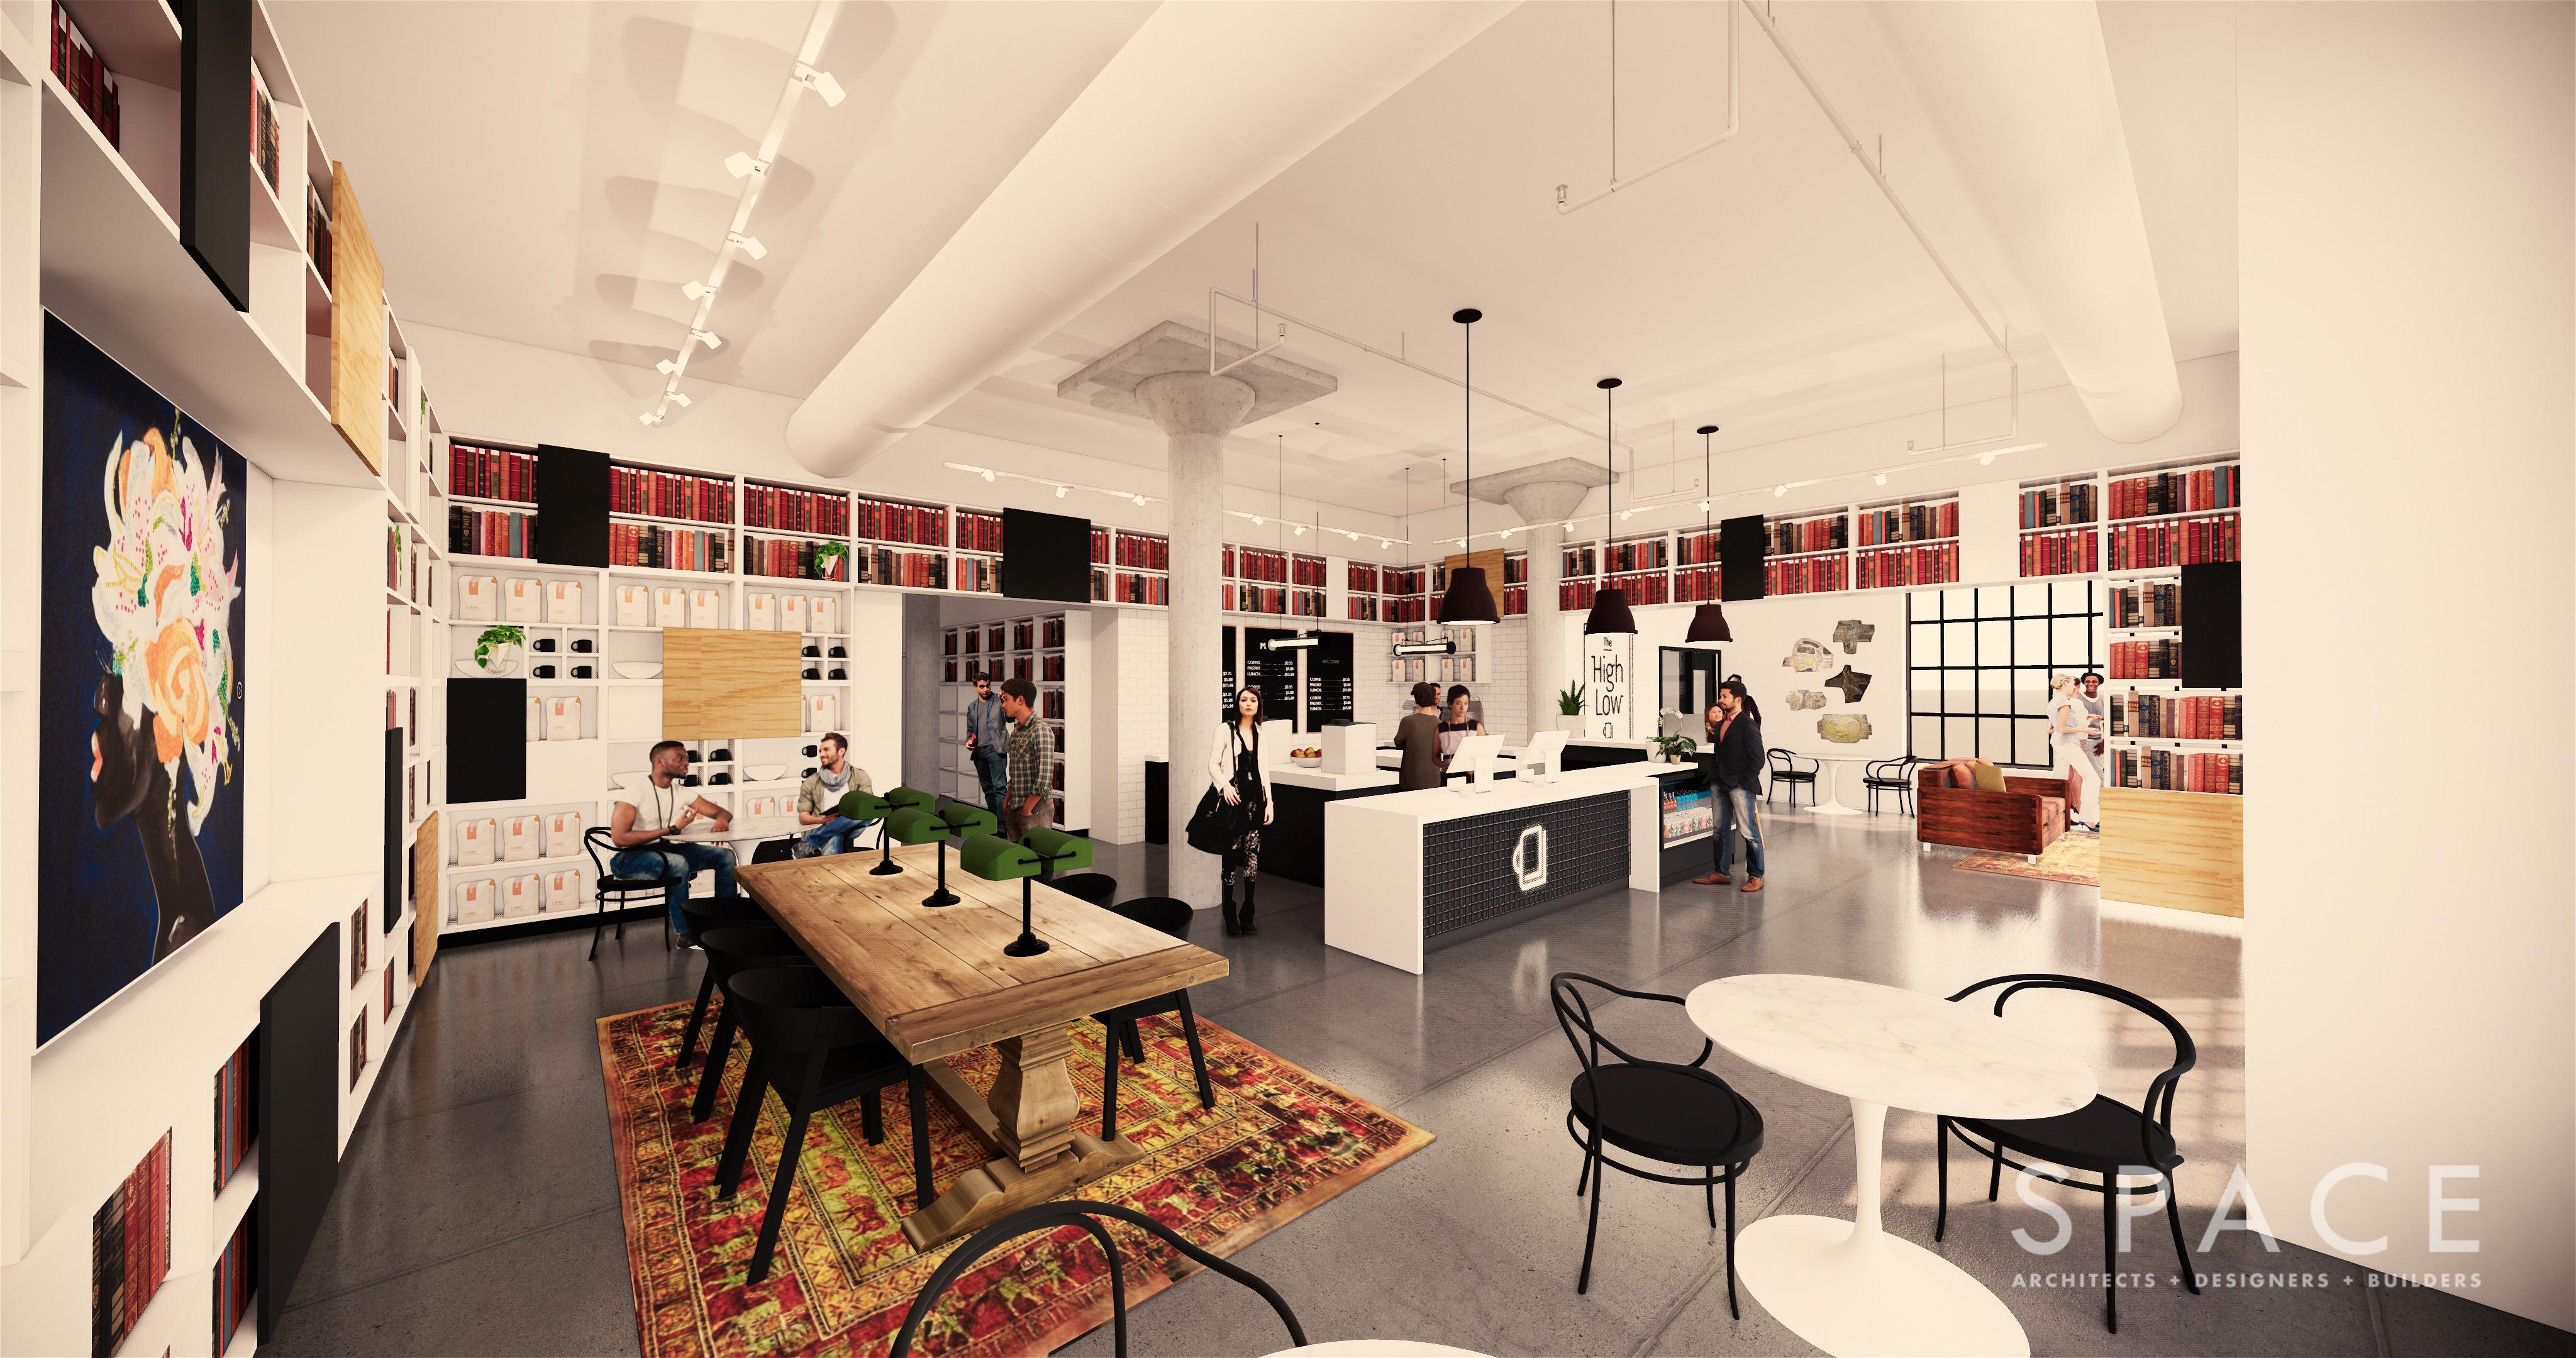 Kranzberg Art Foundation planning new Grand Center facility